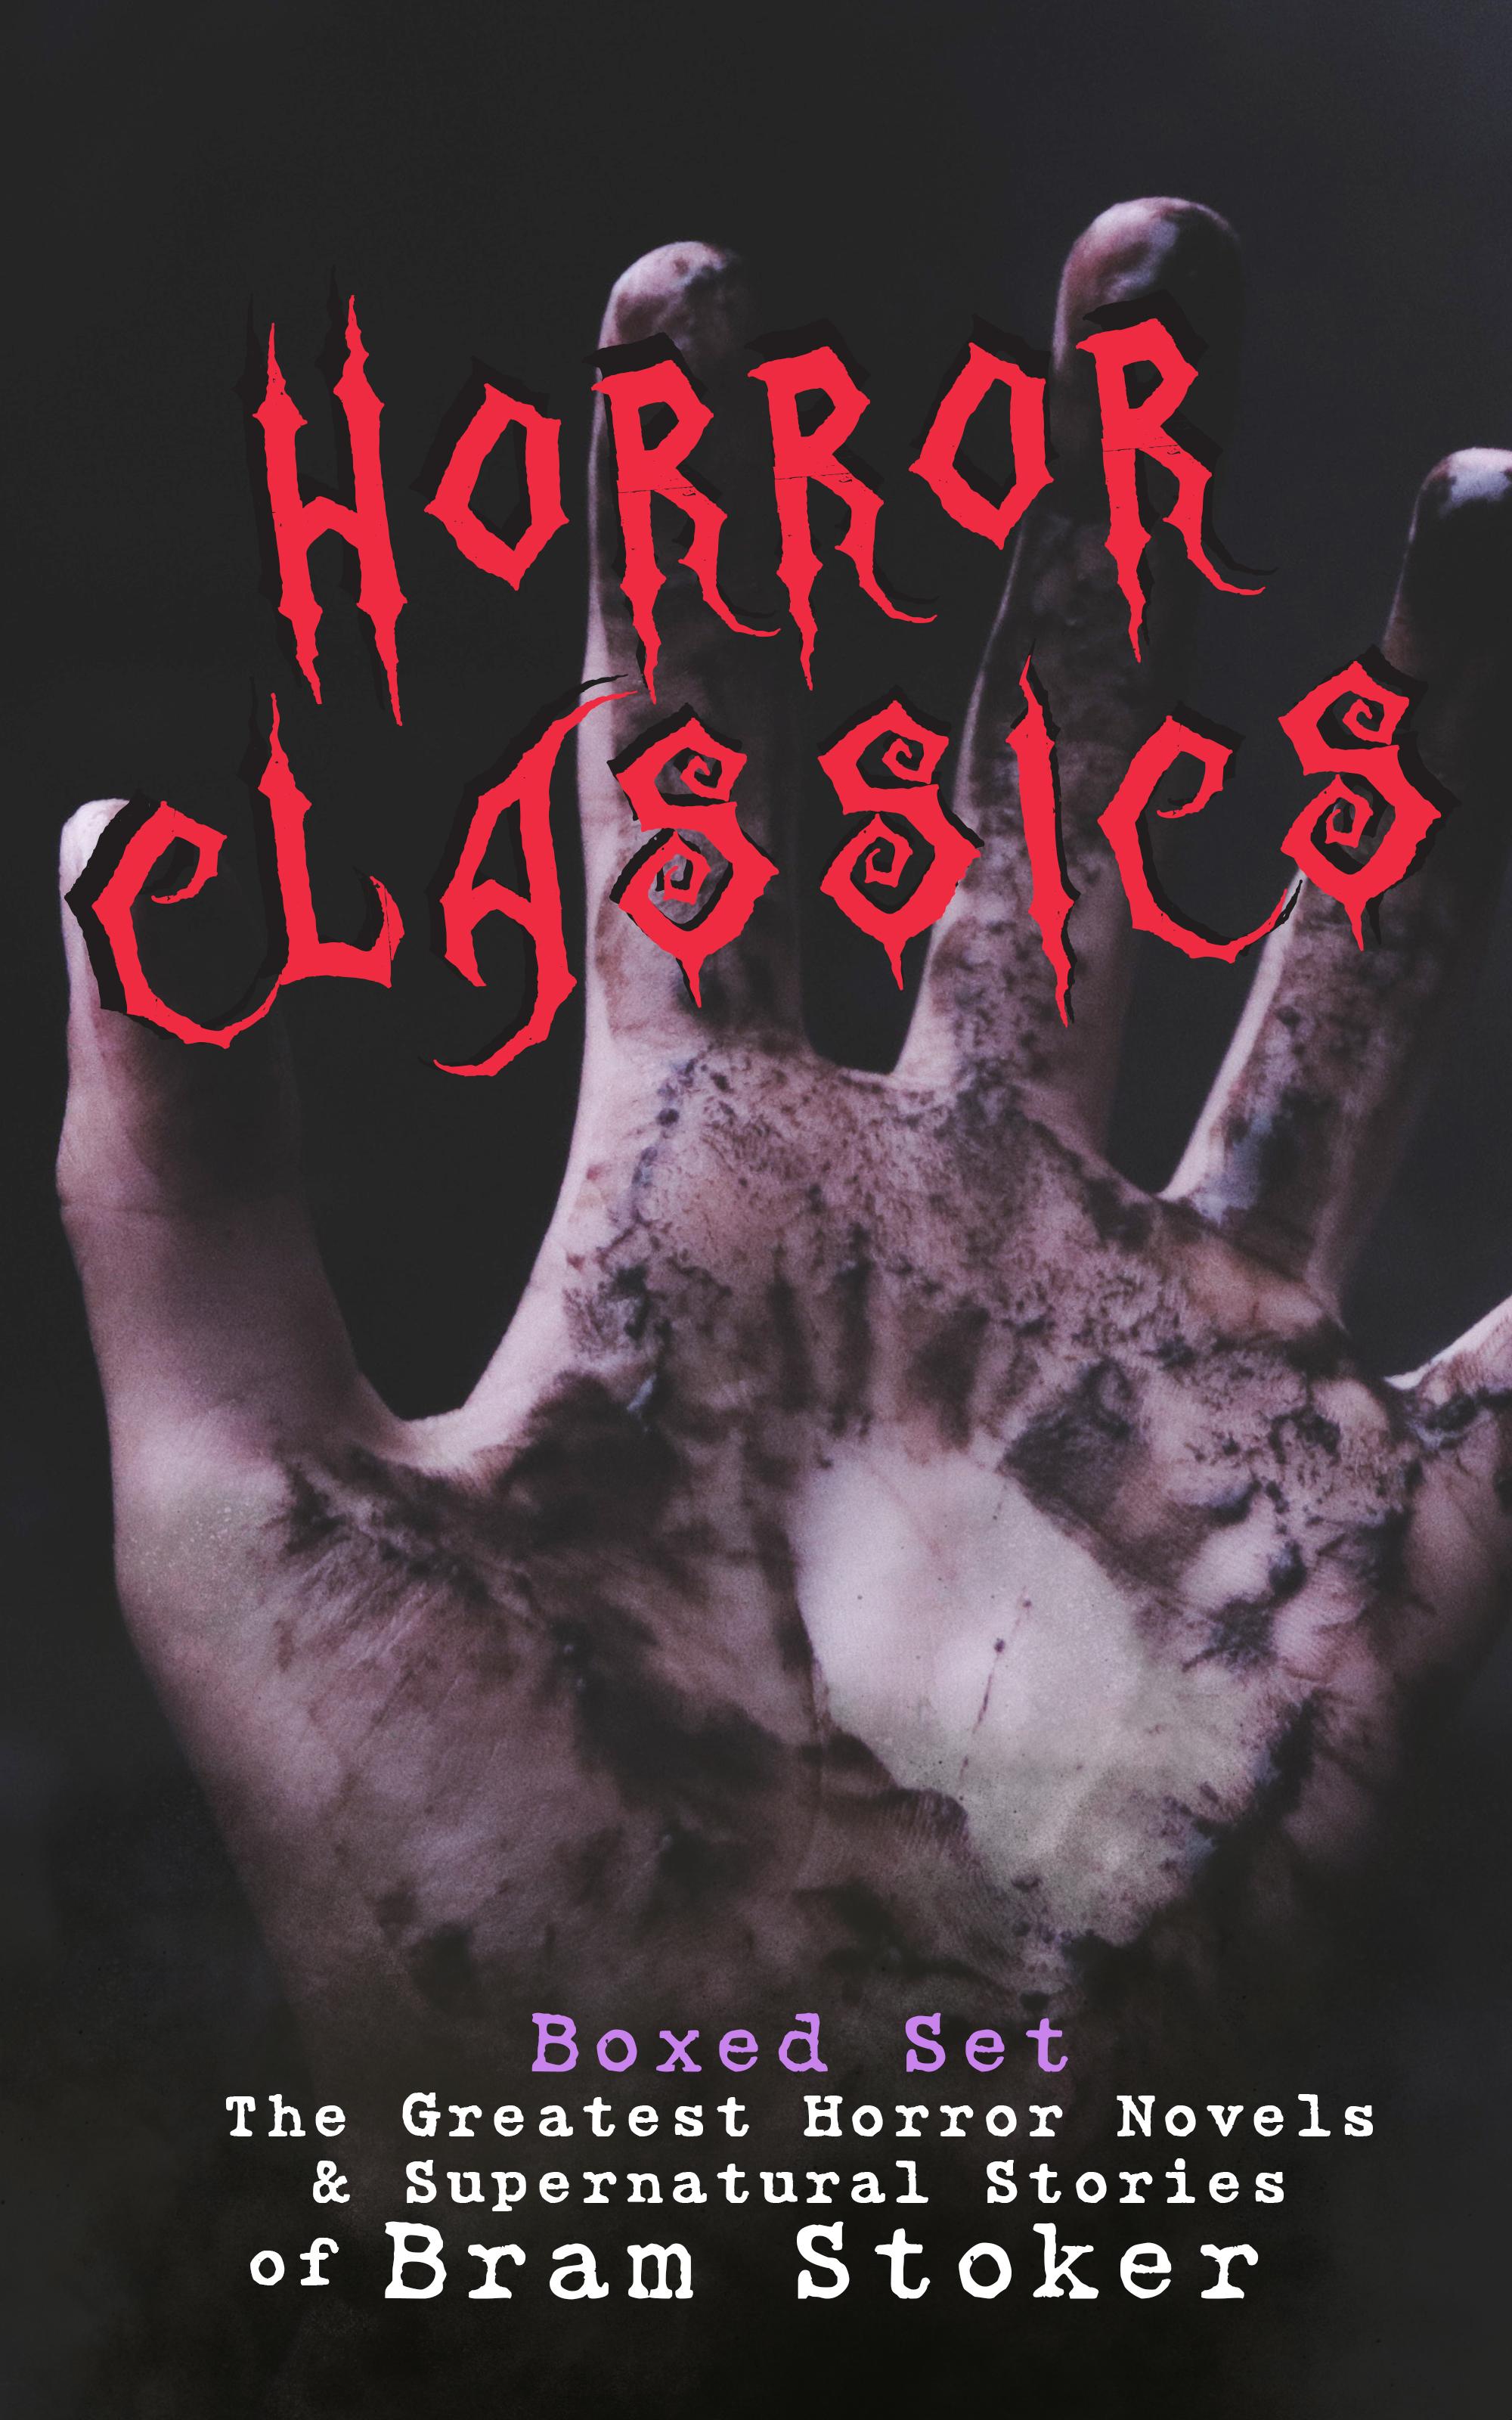 HORROR CLASSICS - Boxed Set: The Greatest Horror Novels #and# Supernatural Stories of Bram Stoker